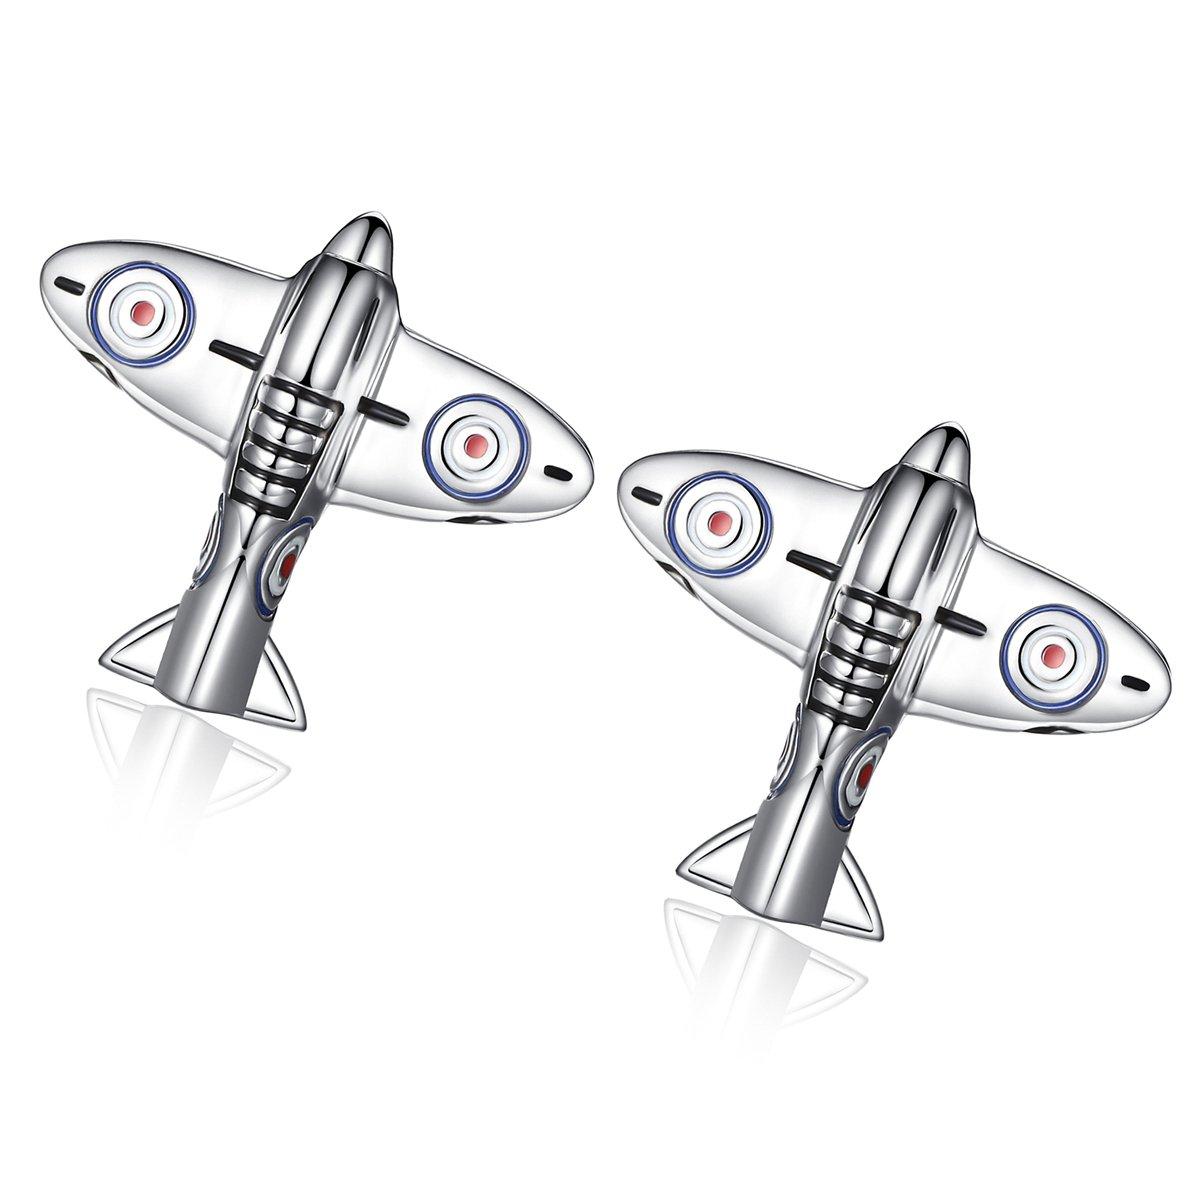 Honey Bear Wwii Fighter Plane Cufflinks - Silver , Stainless Steel , Wedding Gift Kardex 5701000167